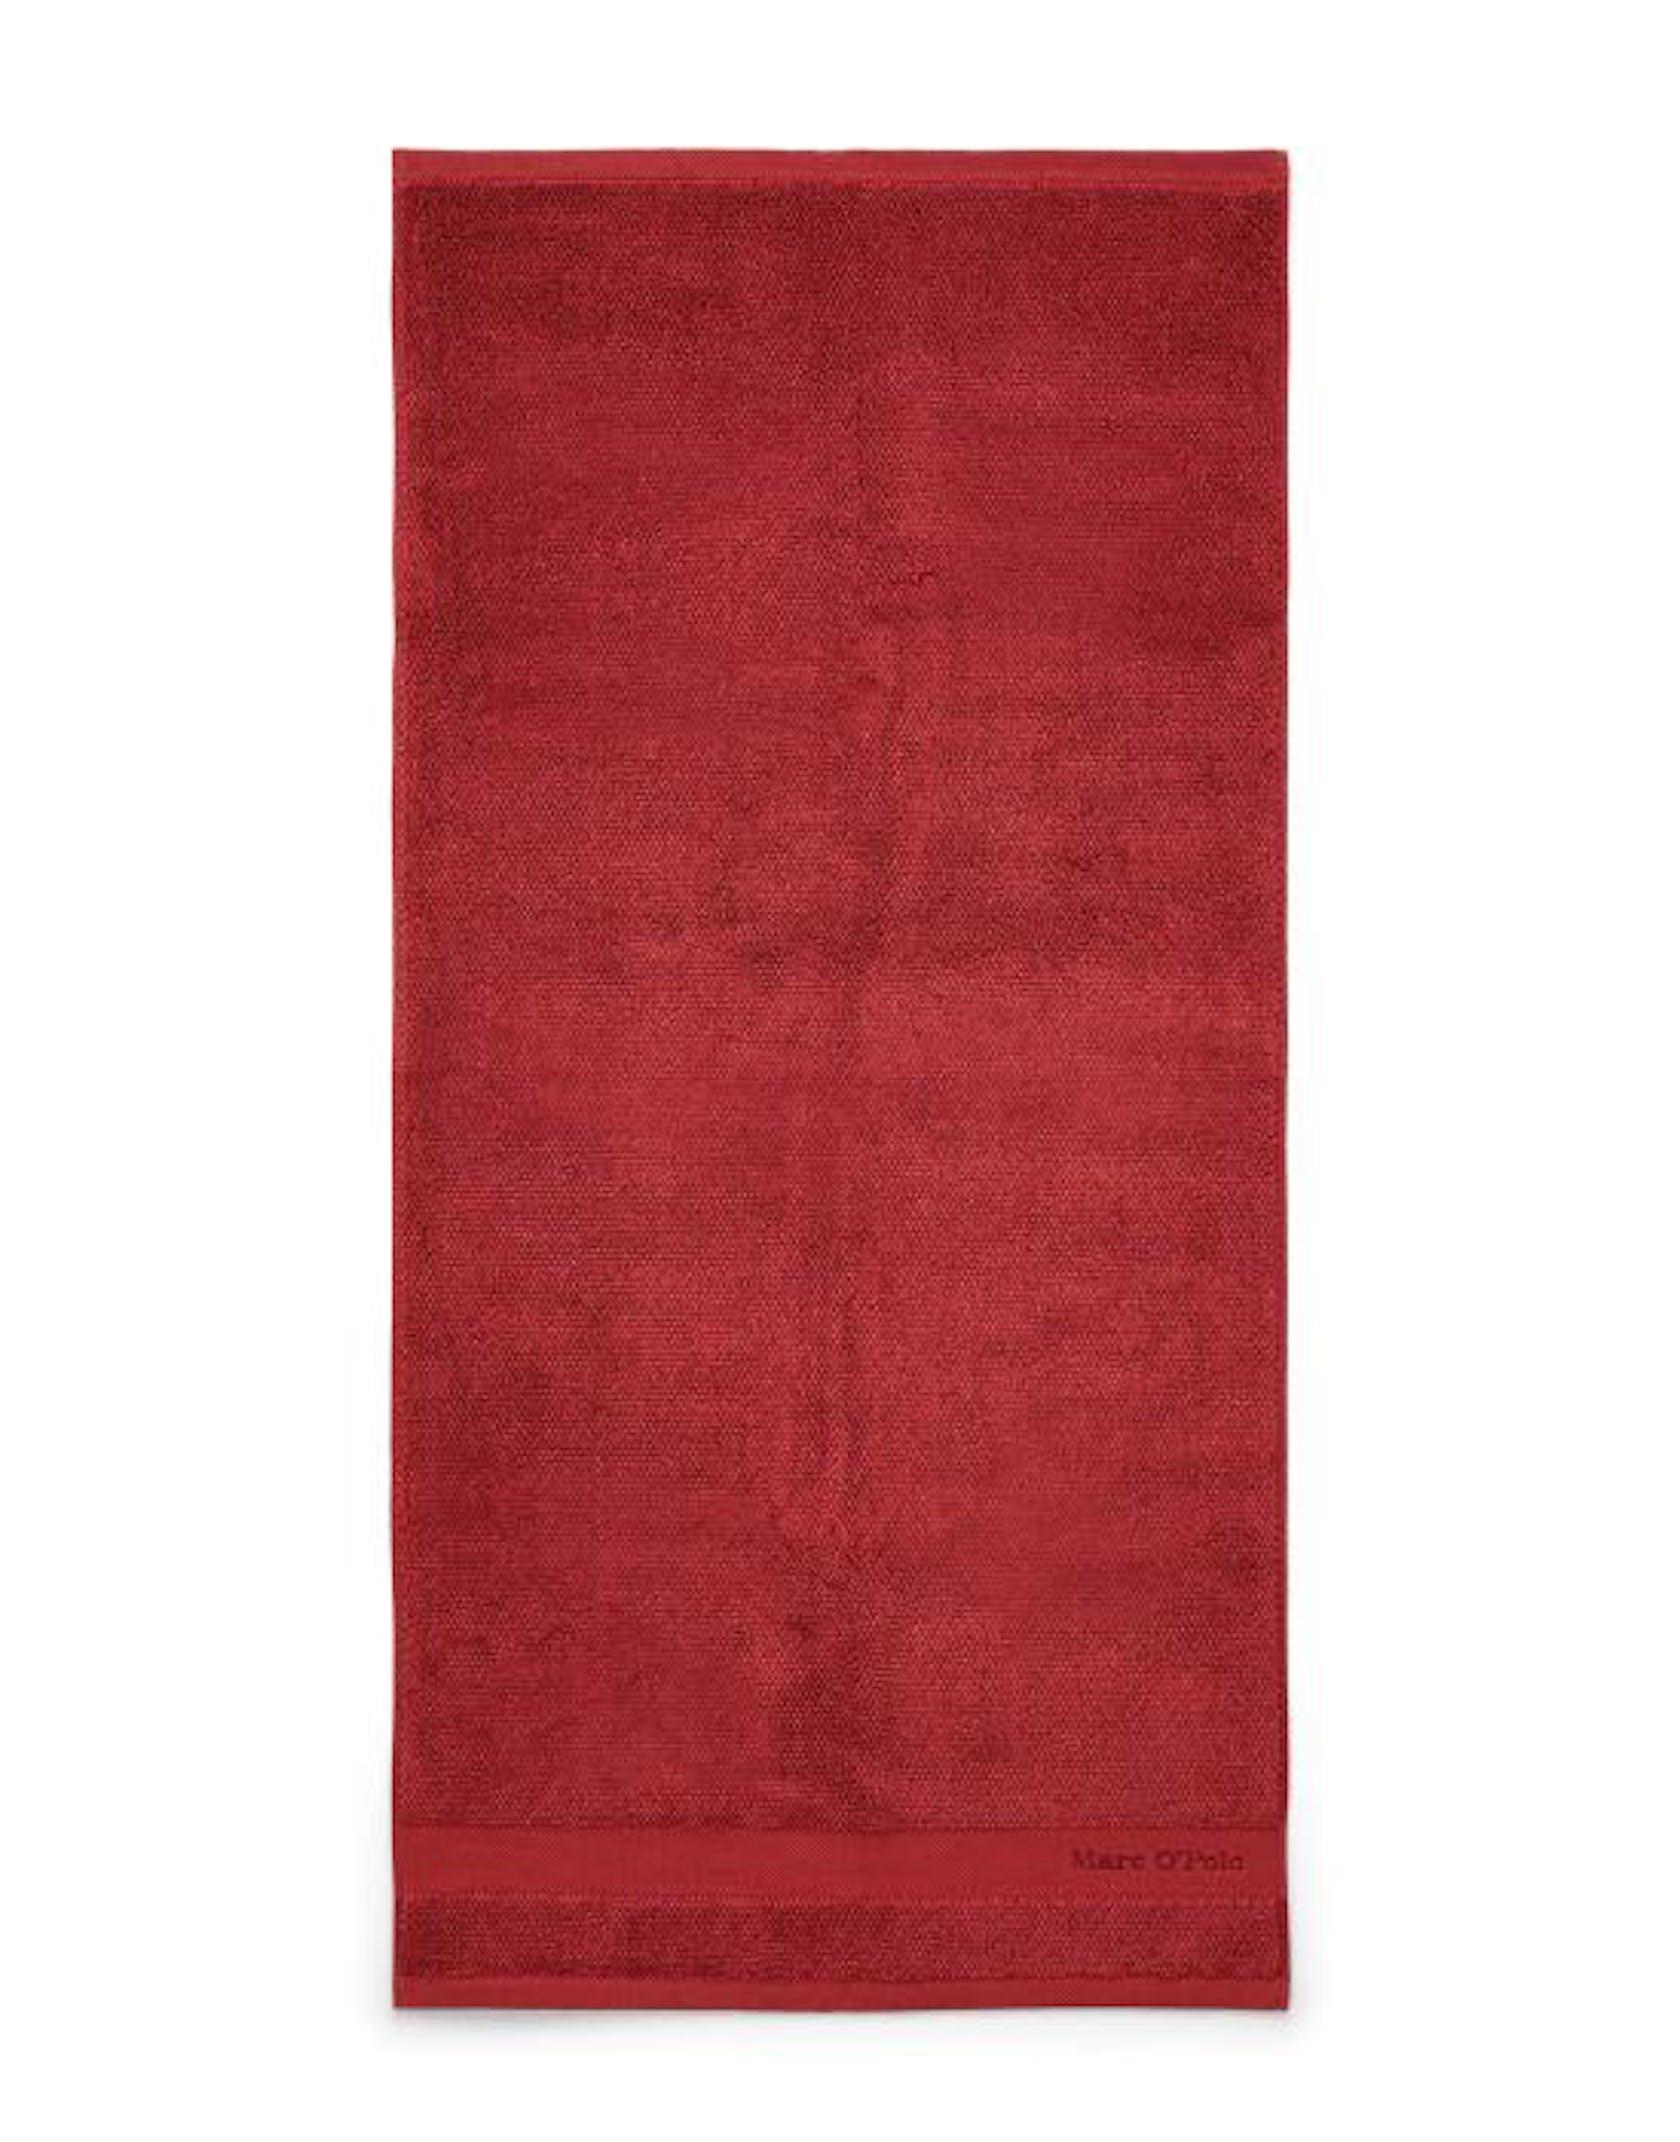 Marc O'Polo Melange Handtuch Meliert Deep Rose / Warm Red